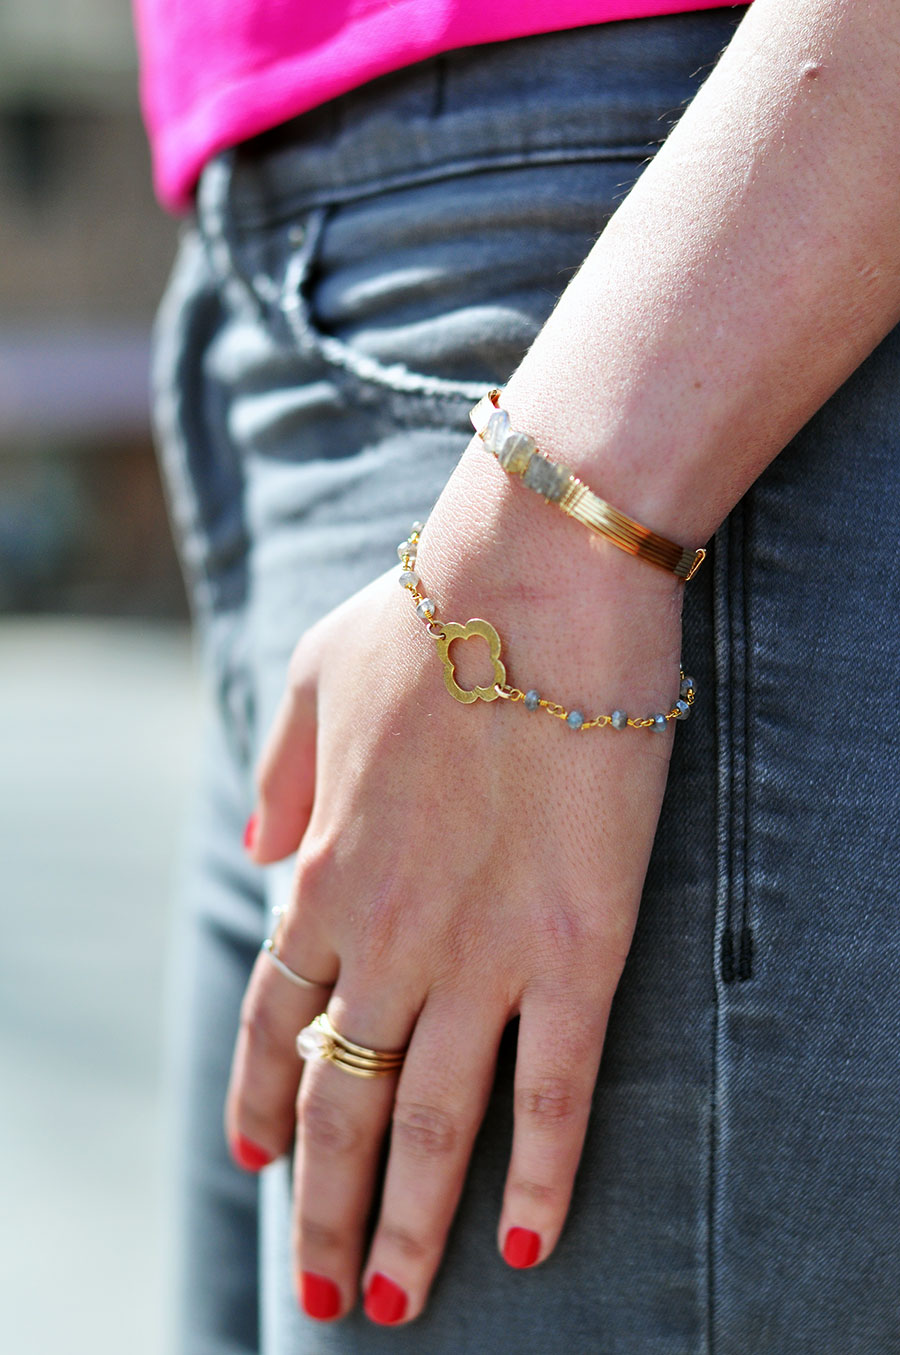 jou-jou-my-love-handmade-jewelry-atlanta-ga-labradorite-bangle